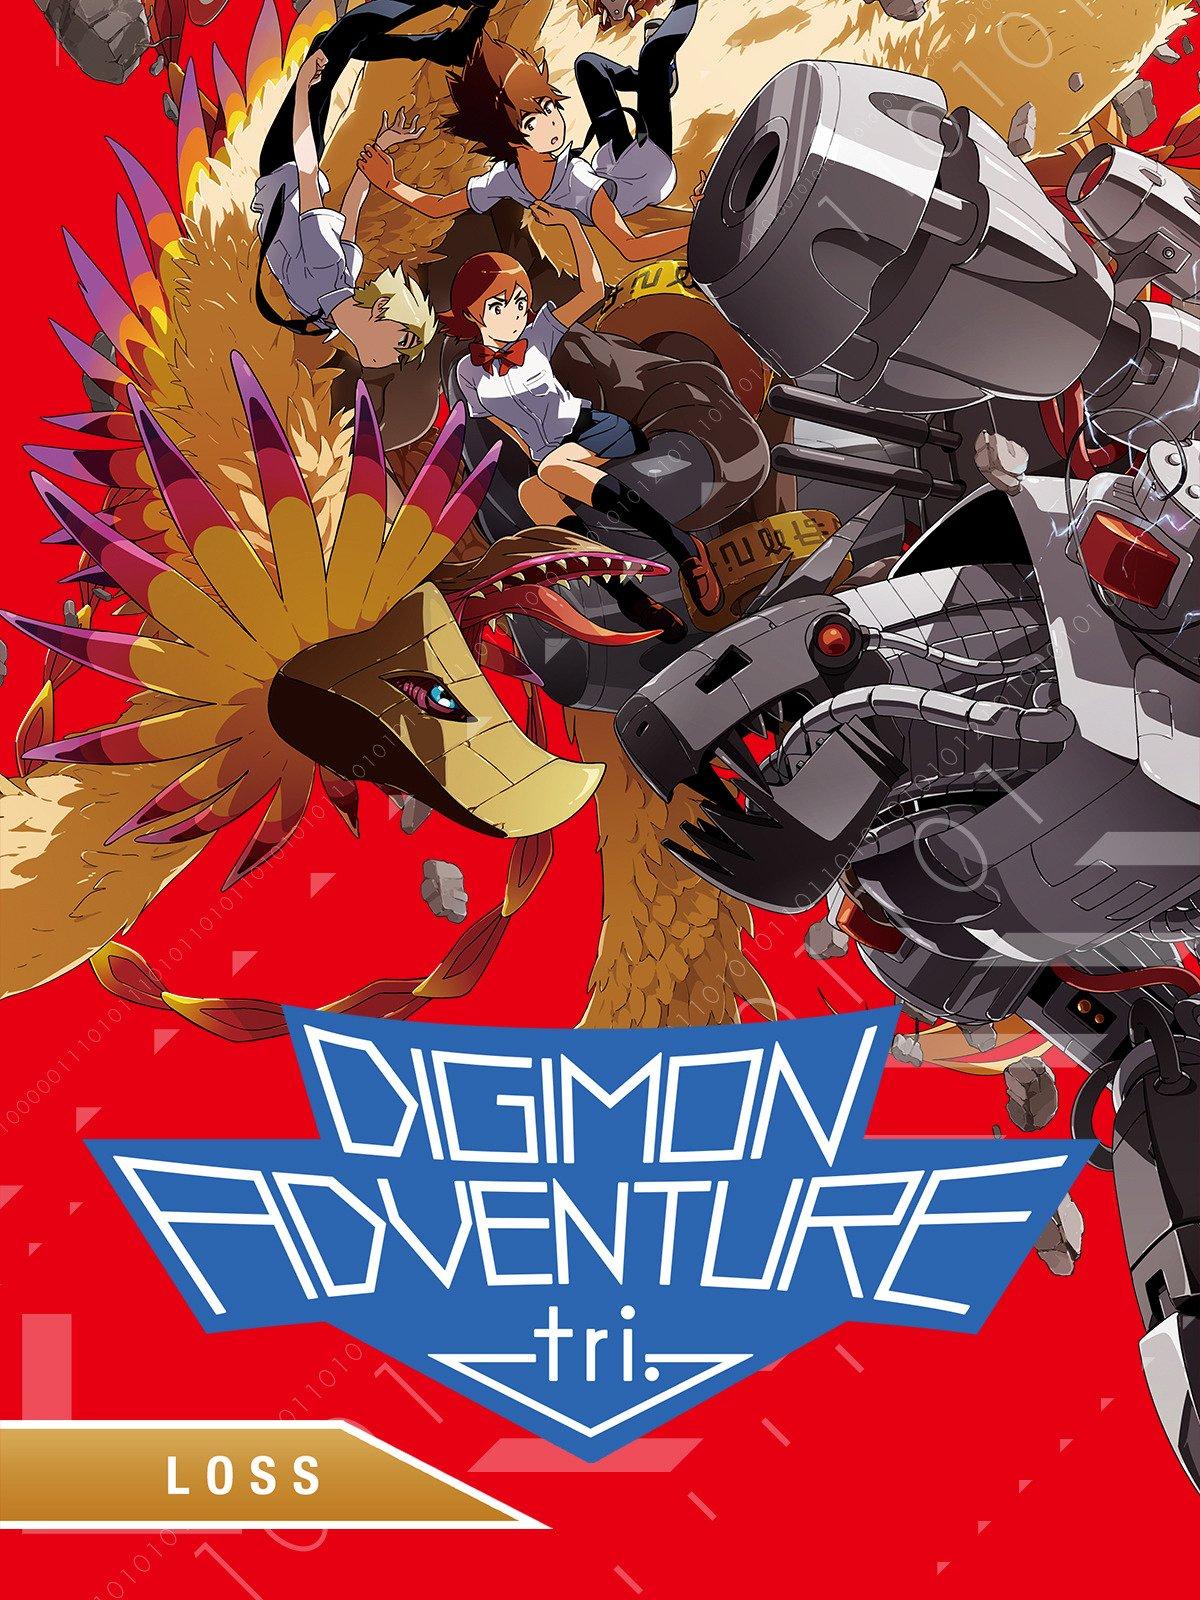 Digimon dating